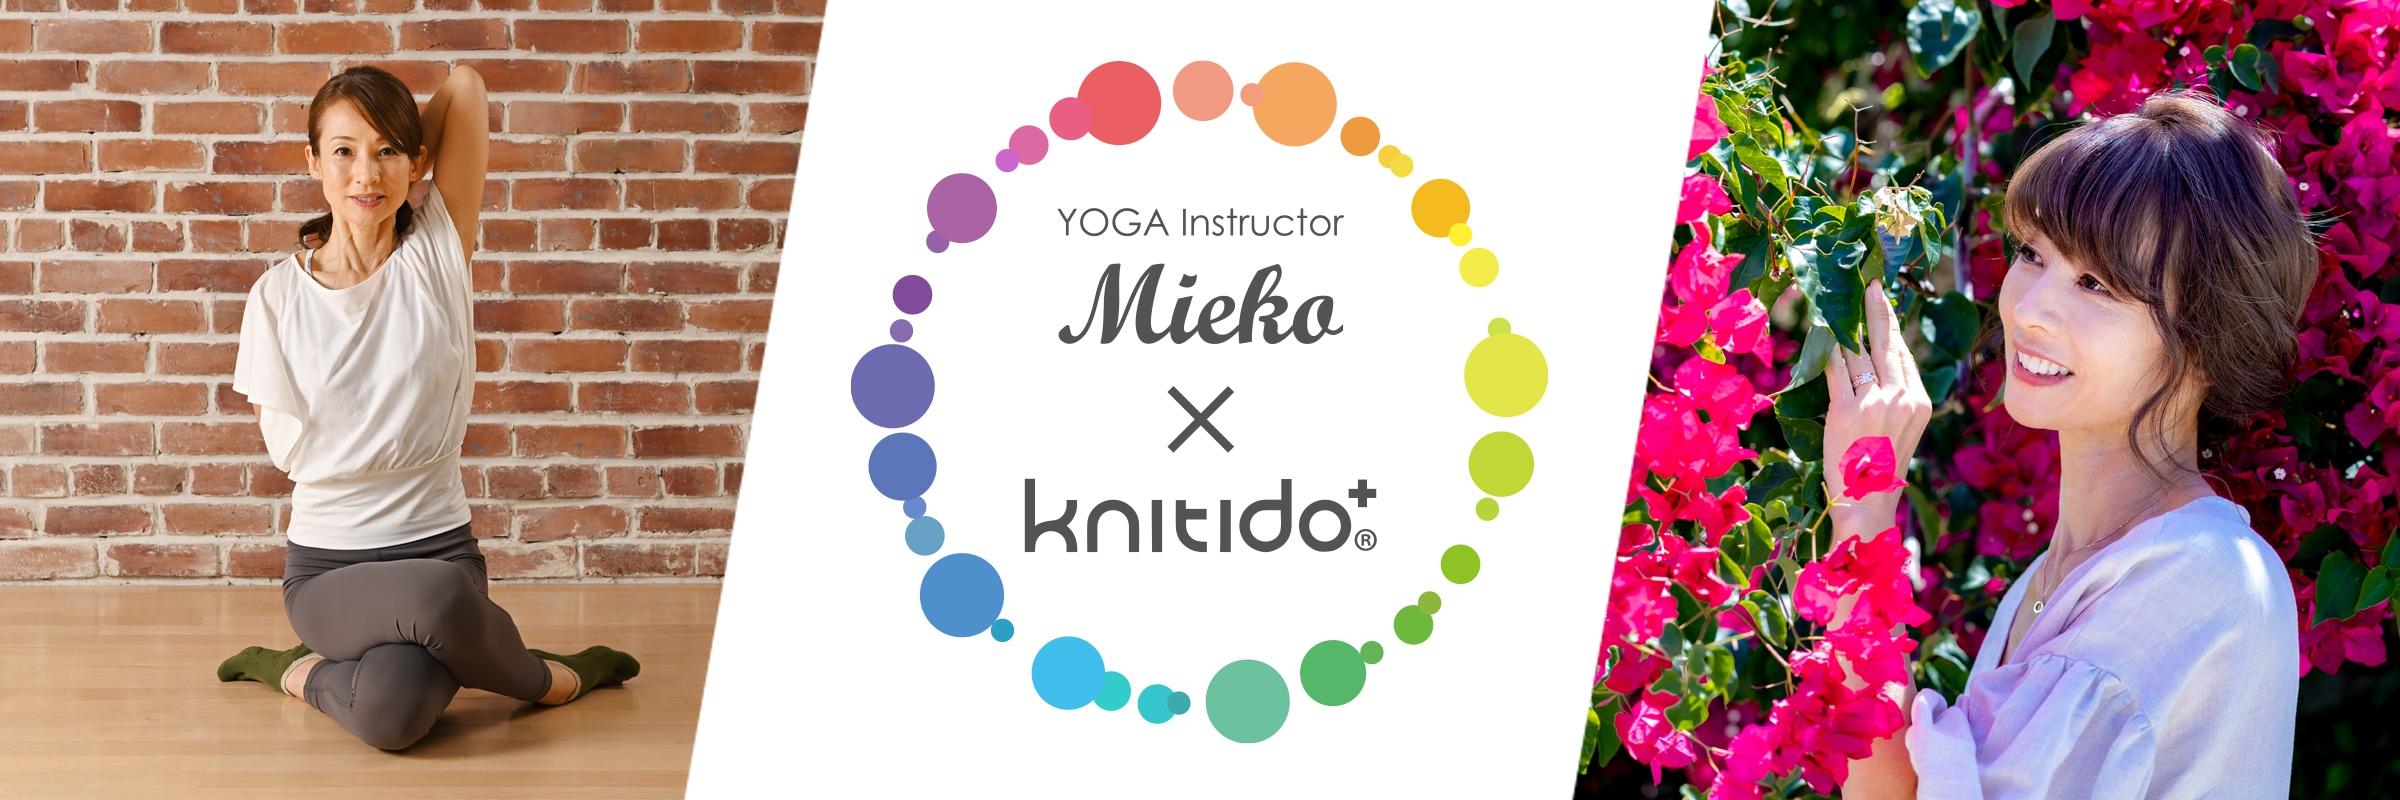 YOGA Instructor Mieko x knitido+